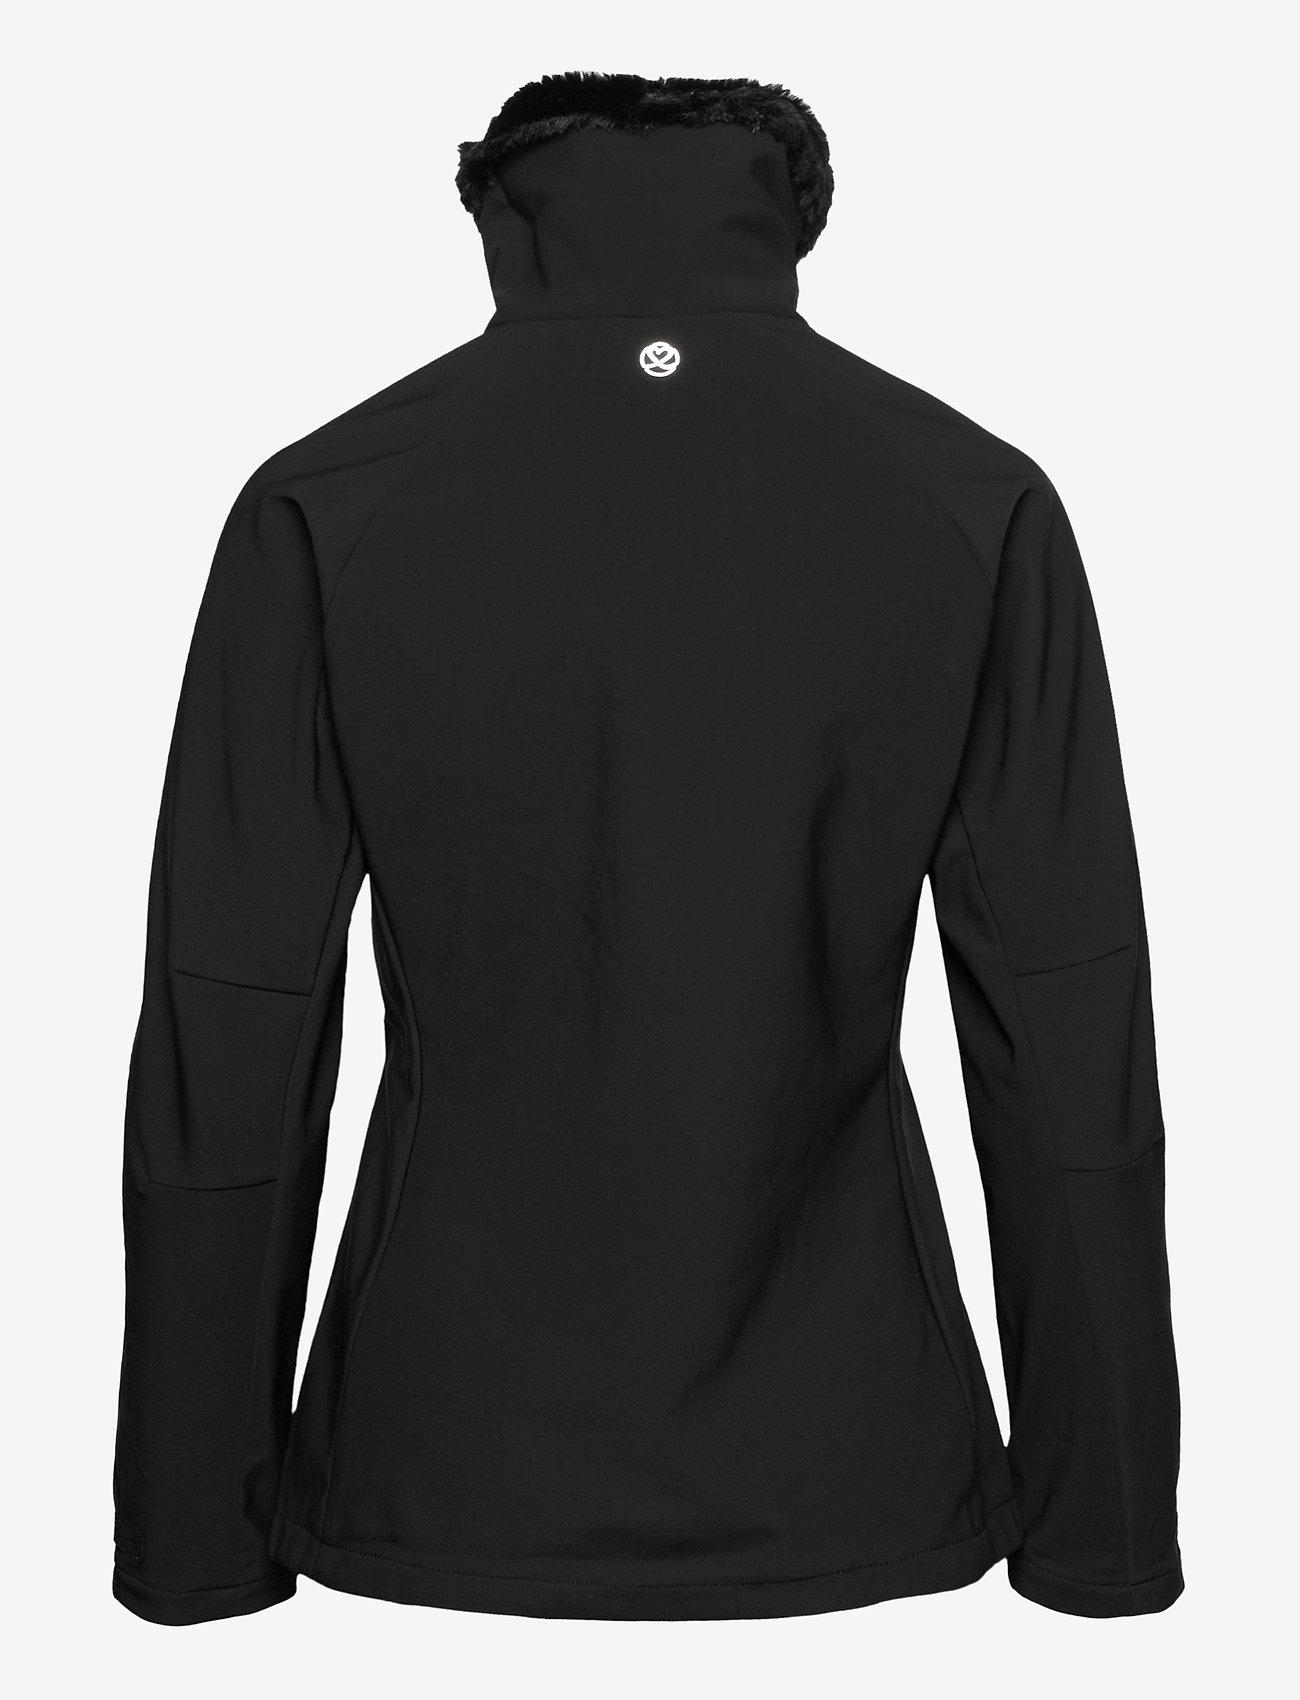 Daily Sports - ALEXIA JACKET - golf jackets - black - 1